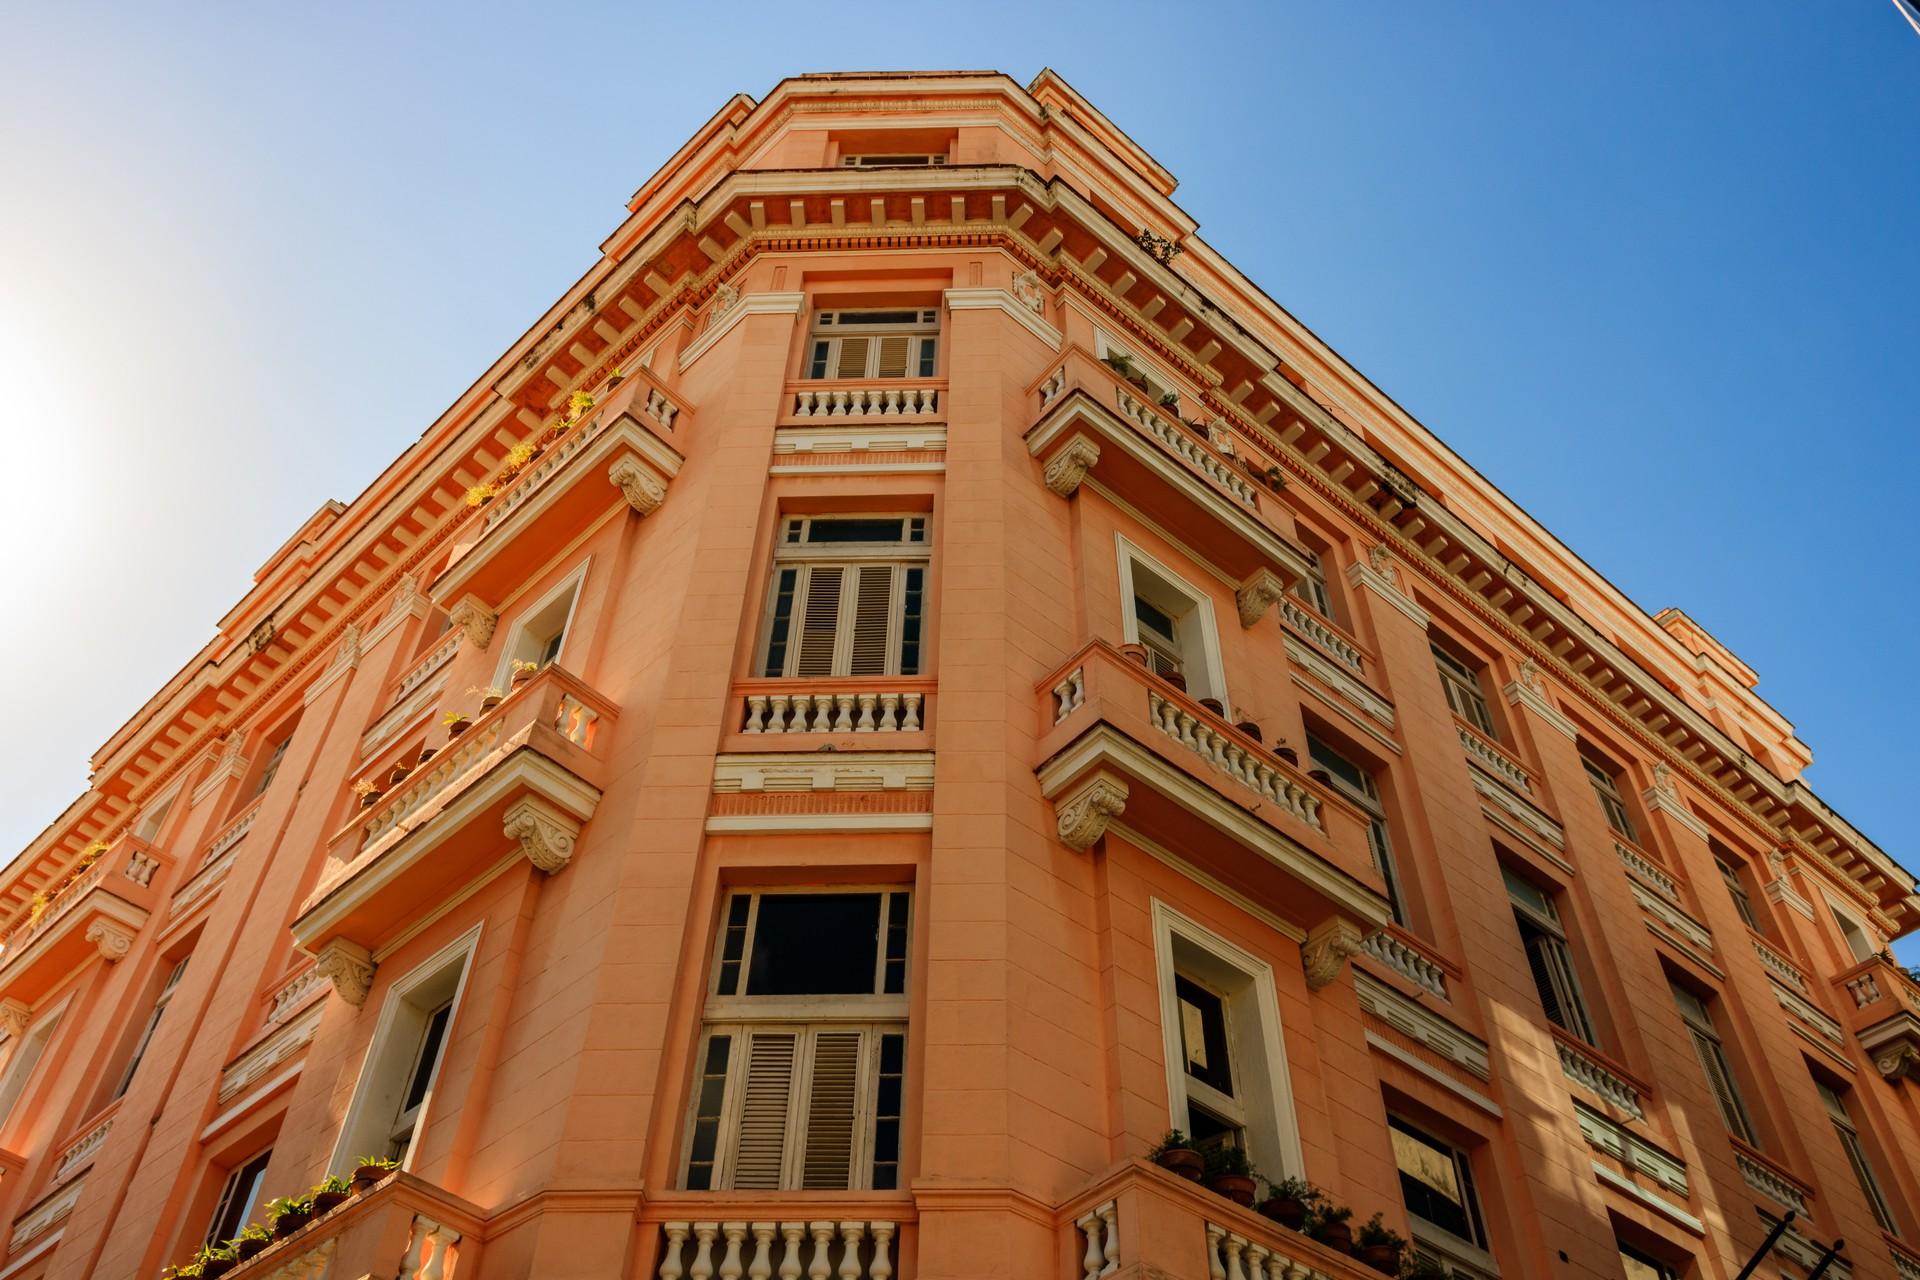 Following in Hemingway's Footsteps: Ambos Mundos Hotel